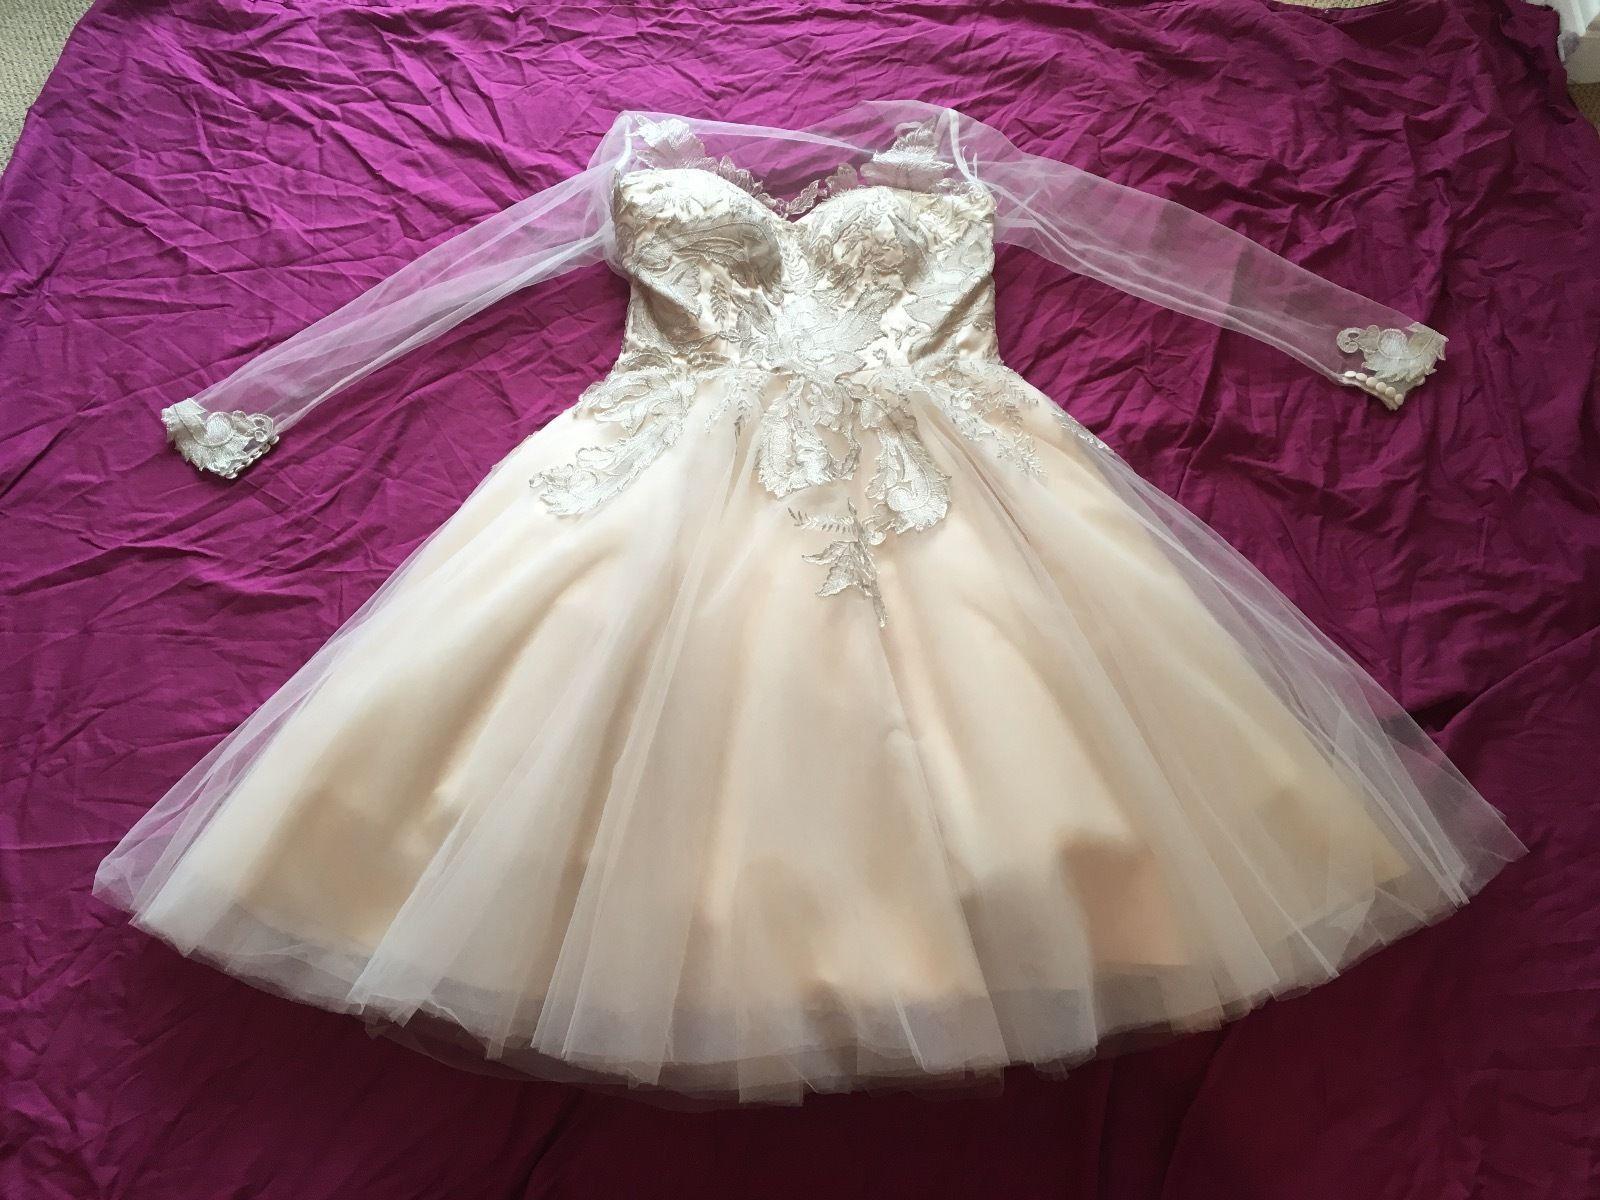 House Of Mooshki Sample Wedding Dress Save 20   Dresses, Wedding ...